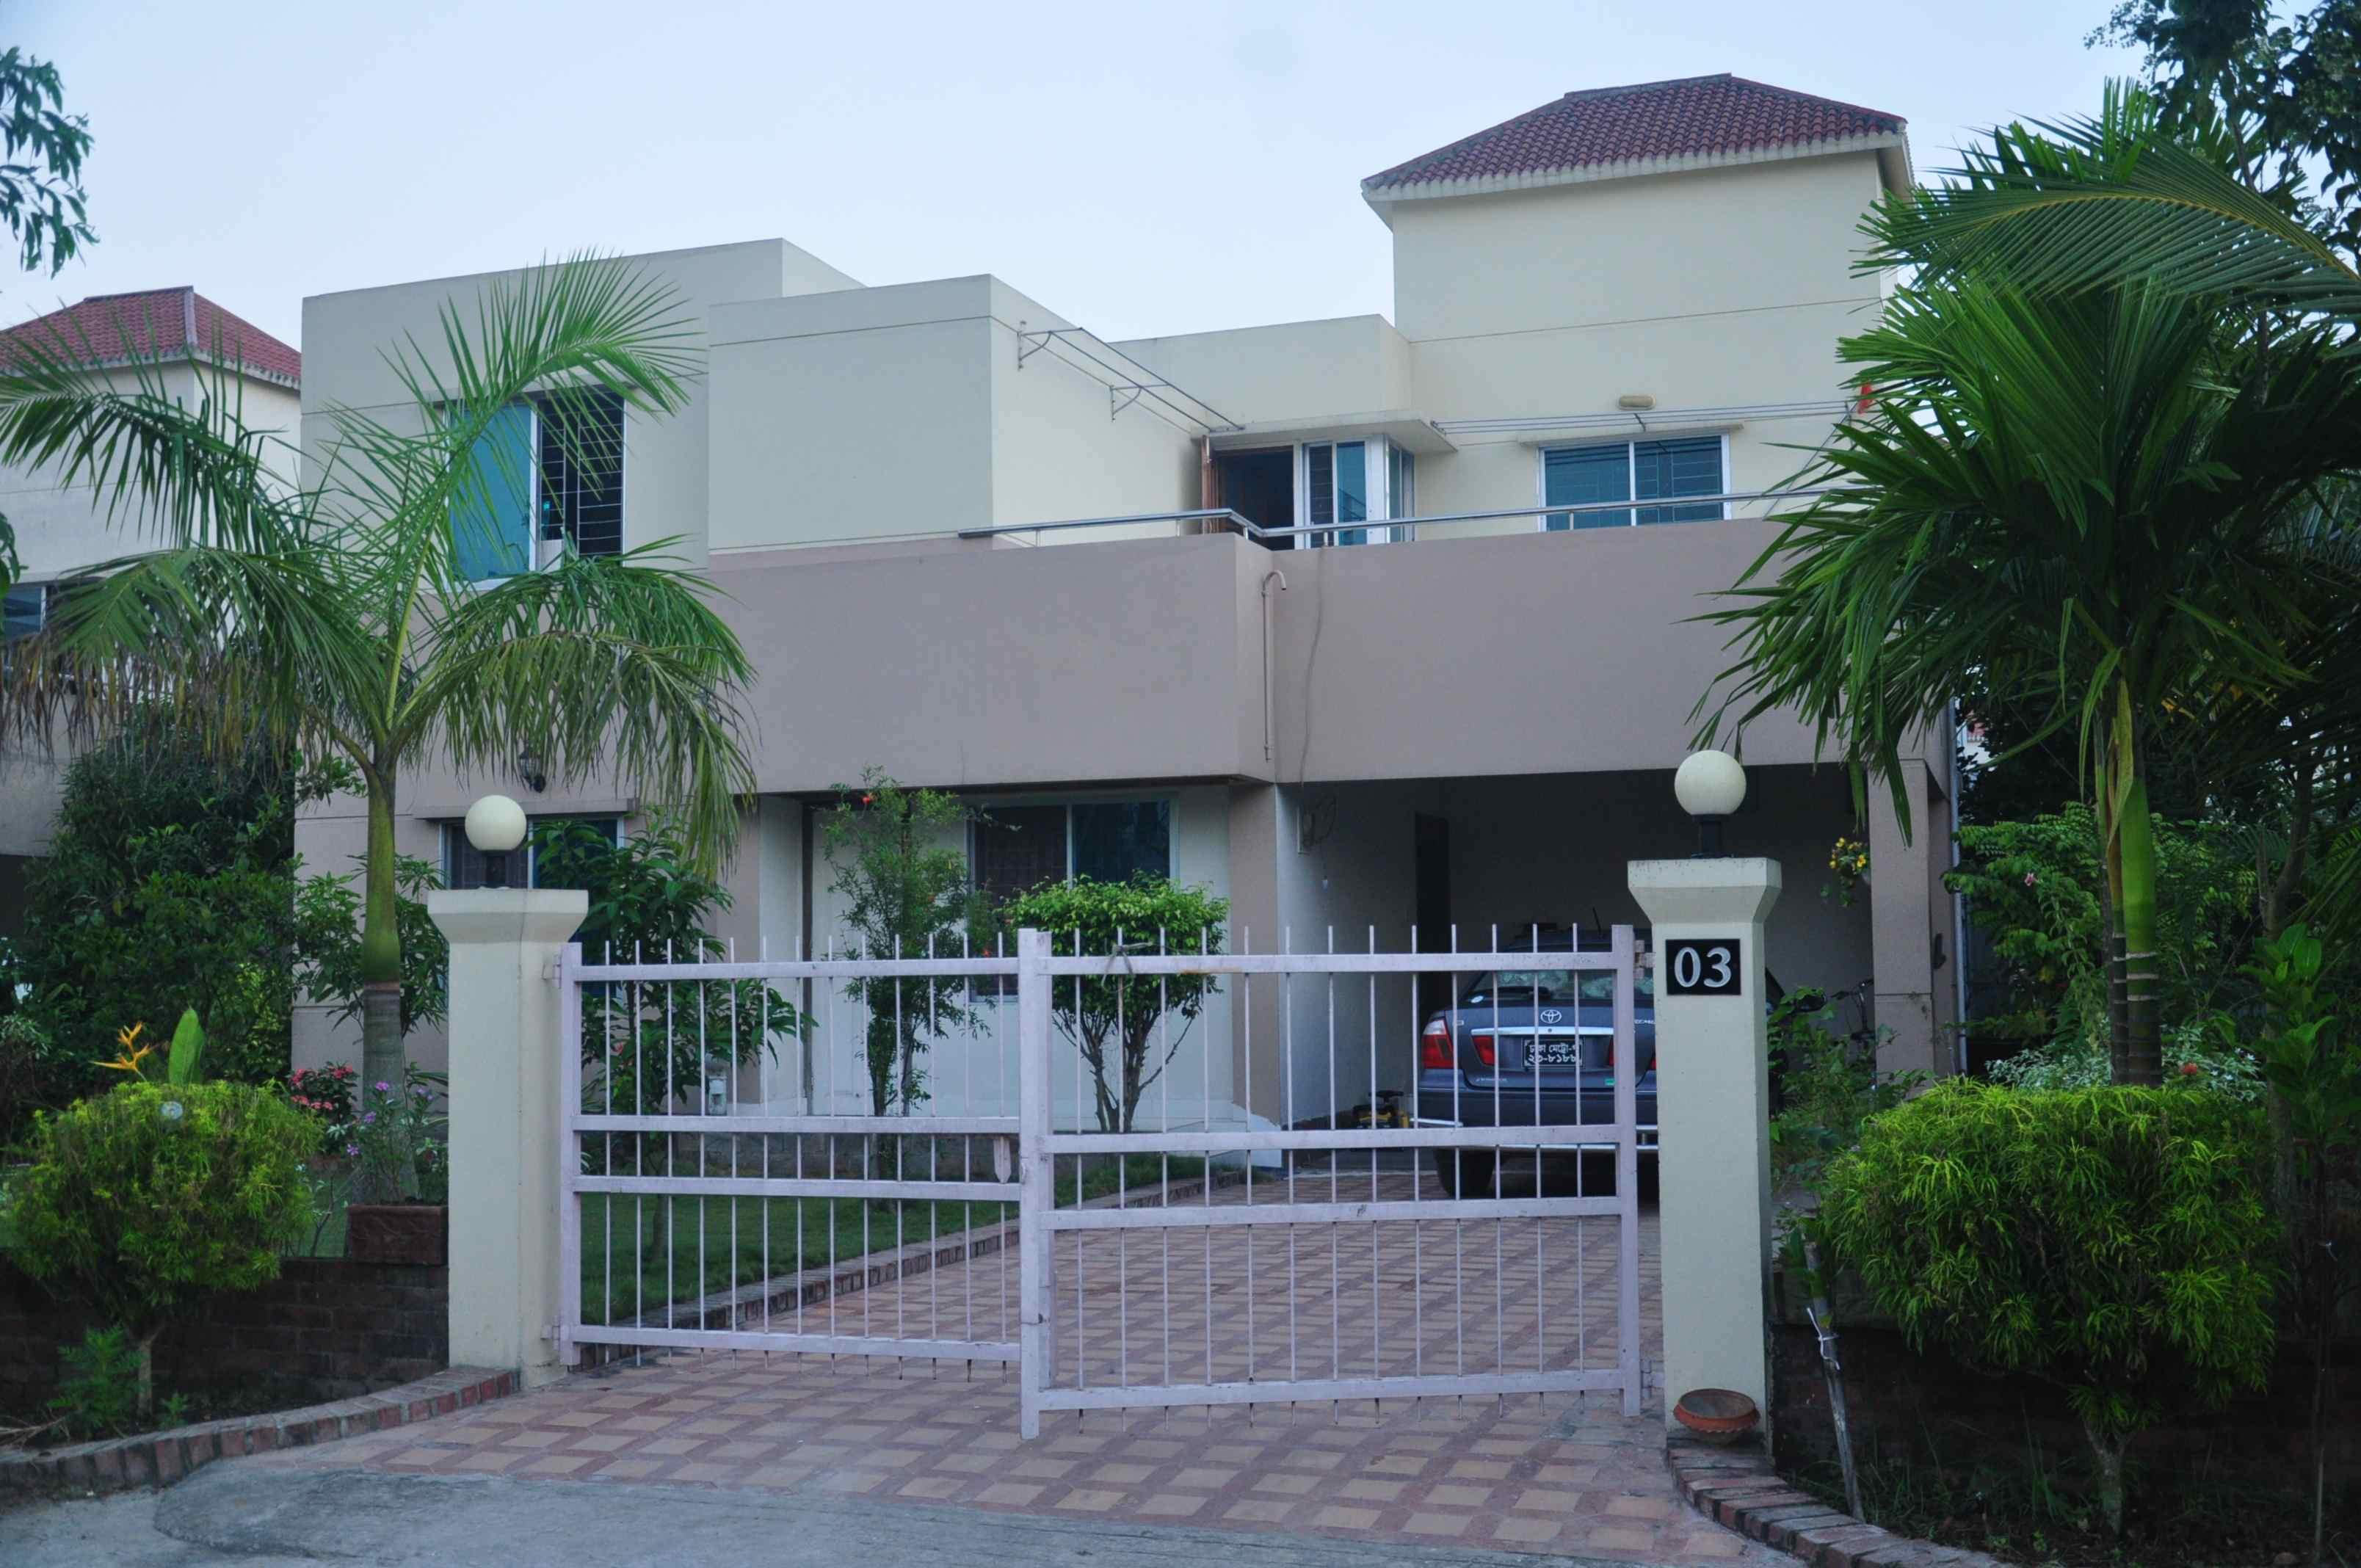 Duplex House Design Bangladesh House Plans 125270,Apartment Floor Plans Two Bedroom